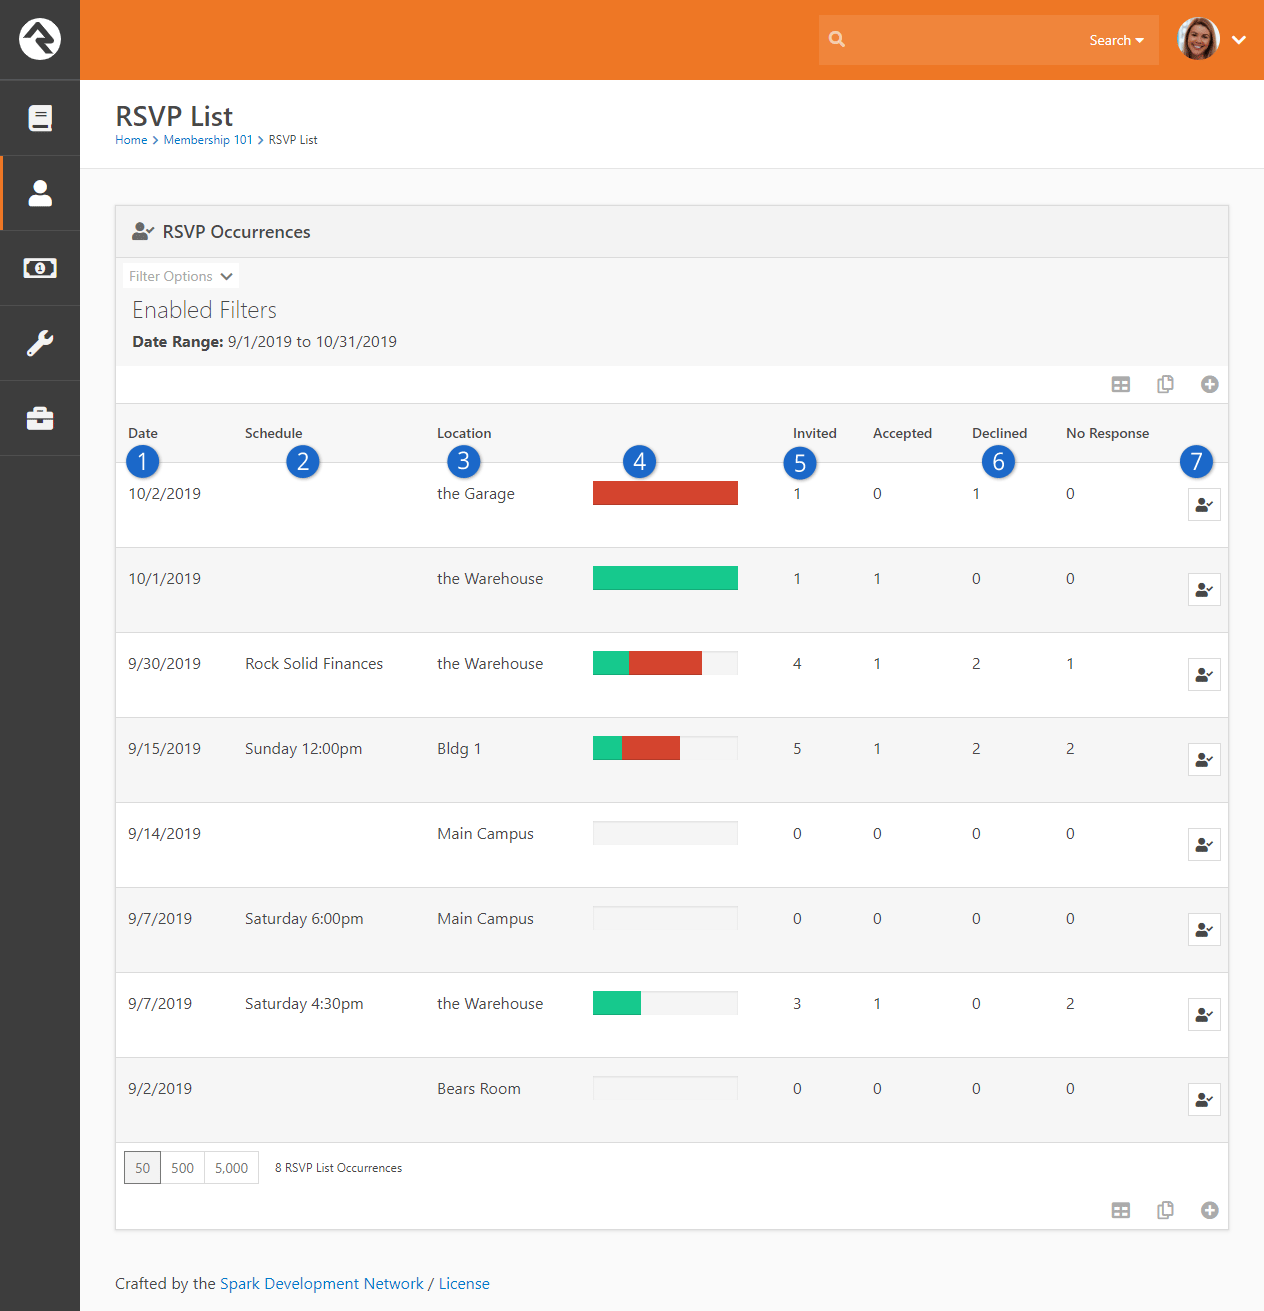 RSVP List Page